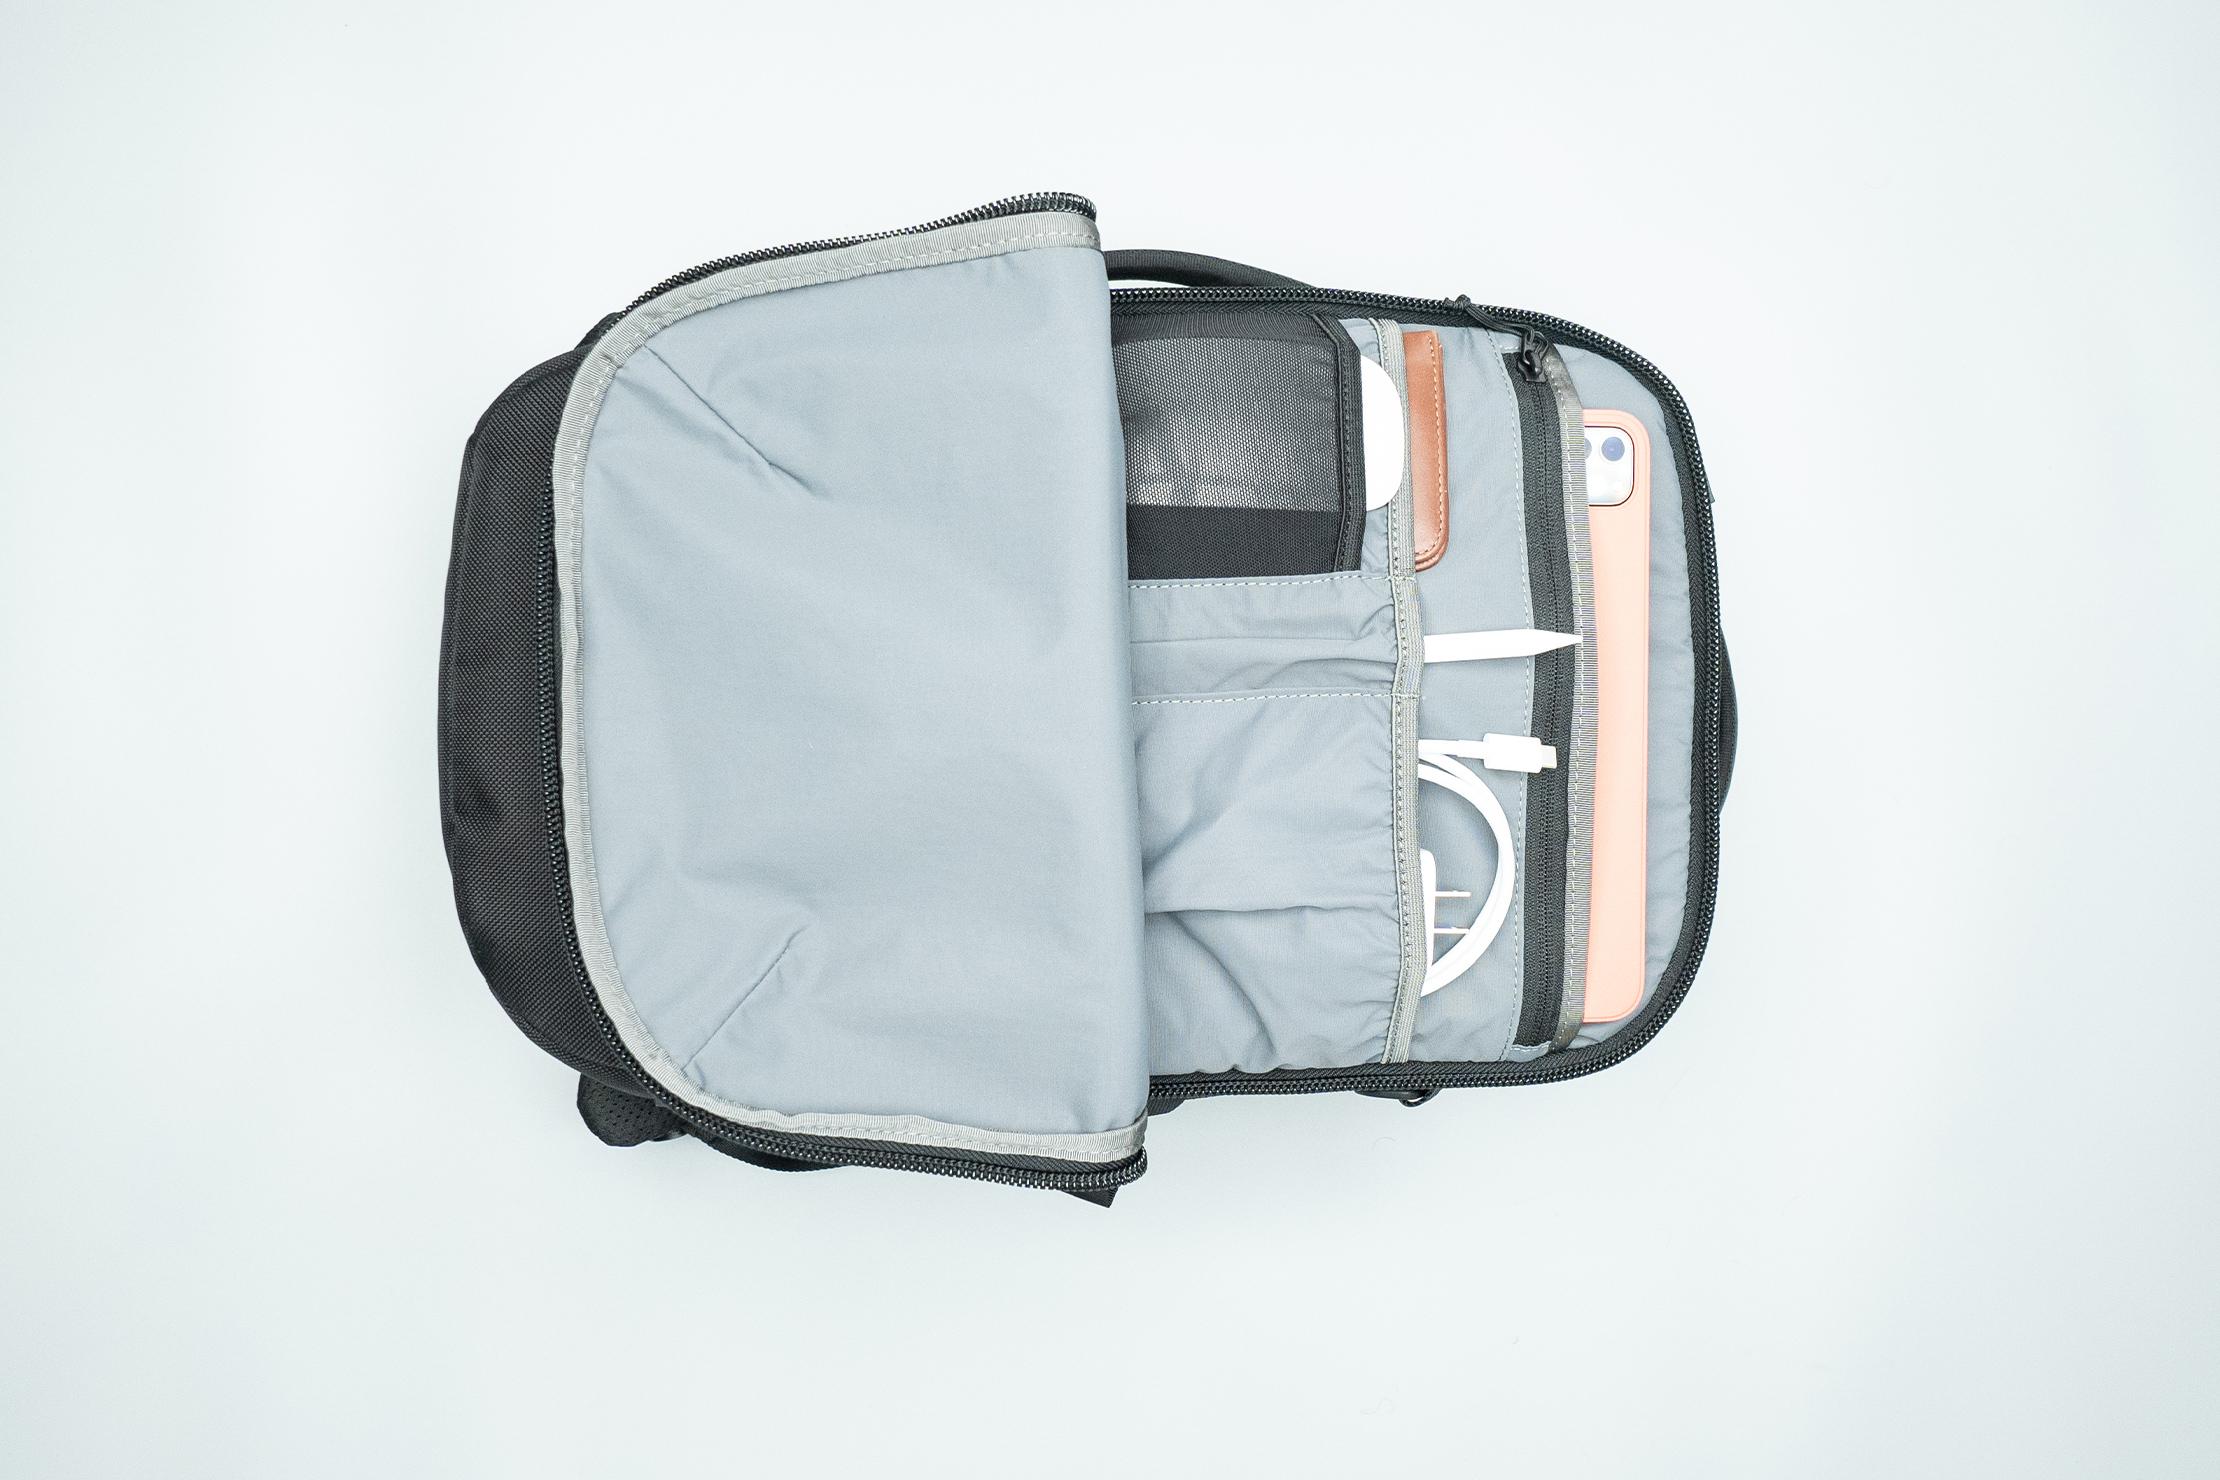 Aer City Pack Tech